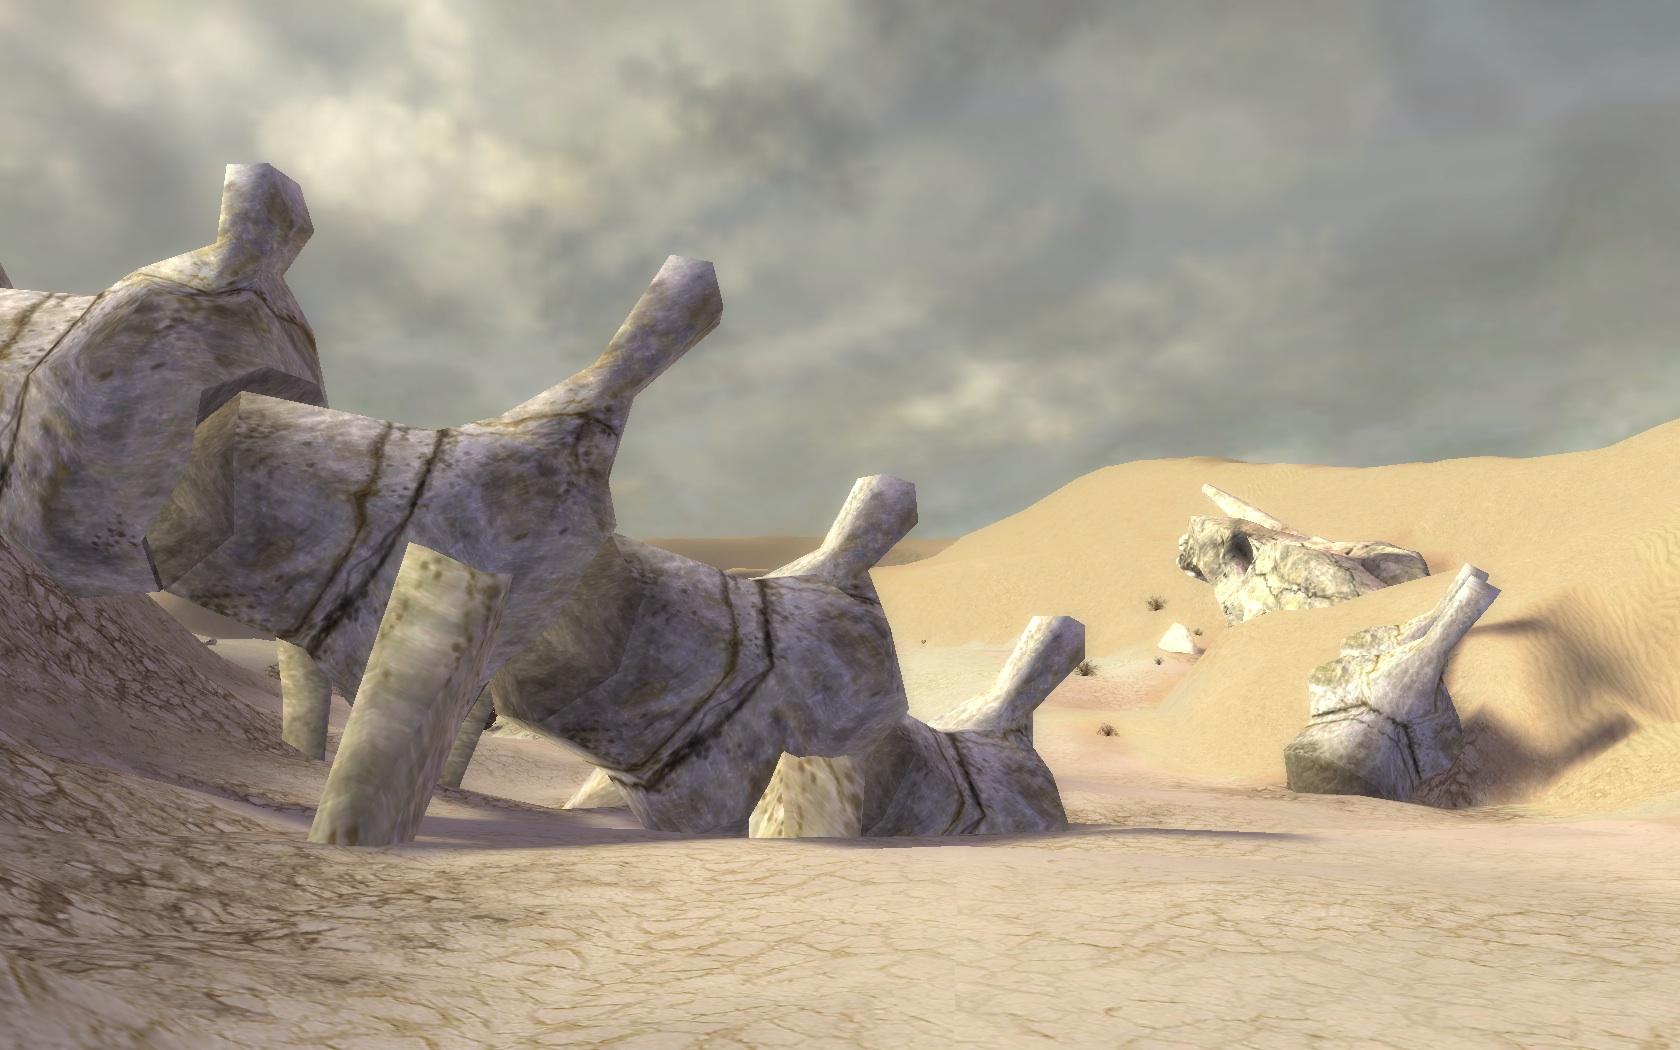 Stones & bones      - Google Slides